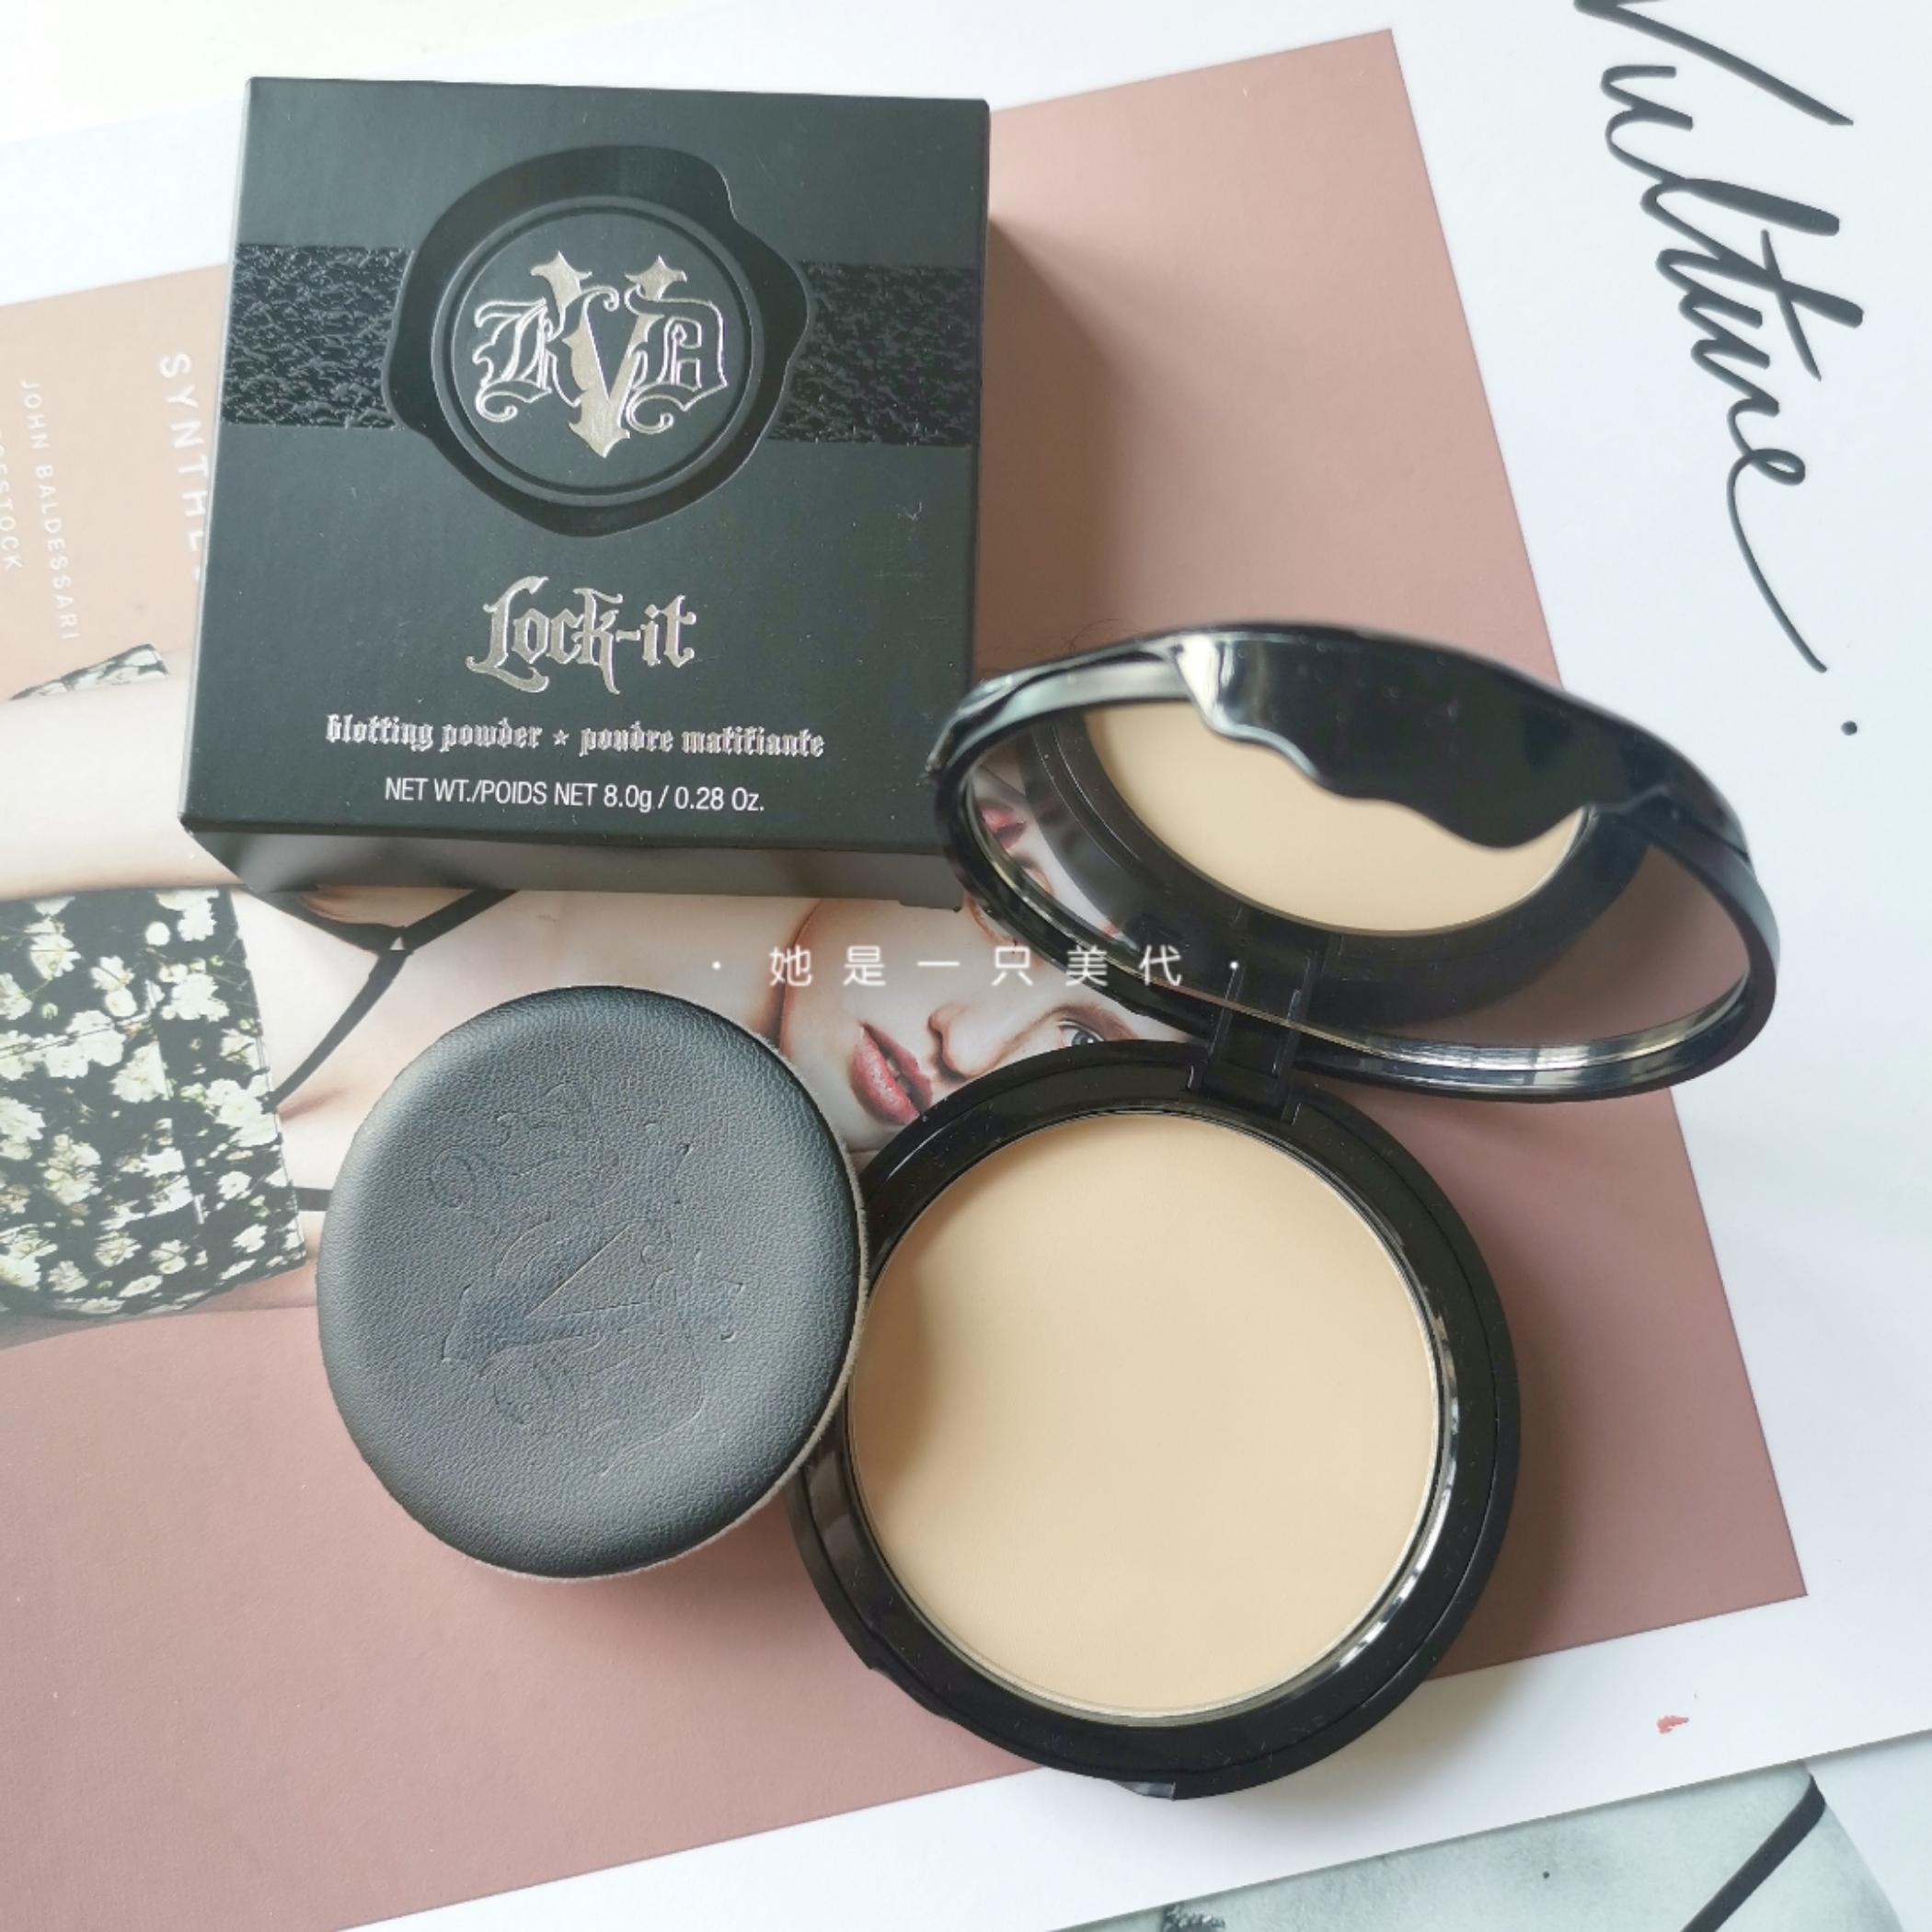 Stock American Kat Von D KVD matte control oil set makeup honey cake K sister recommended fair light